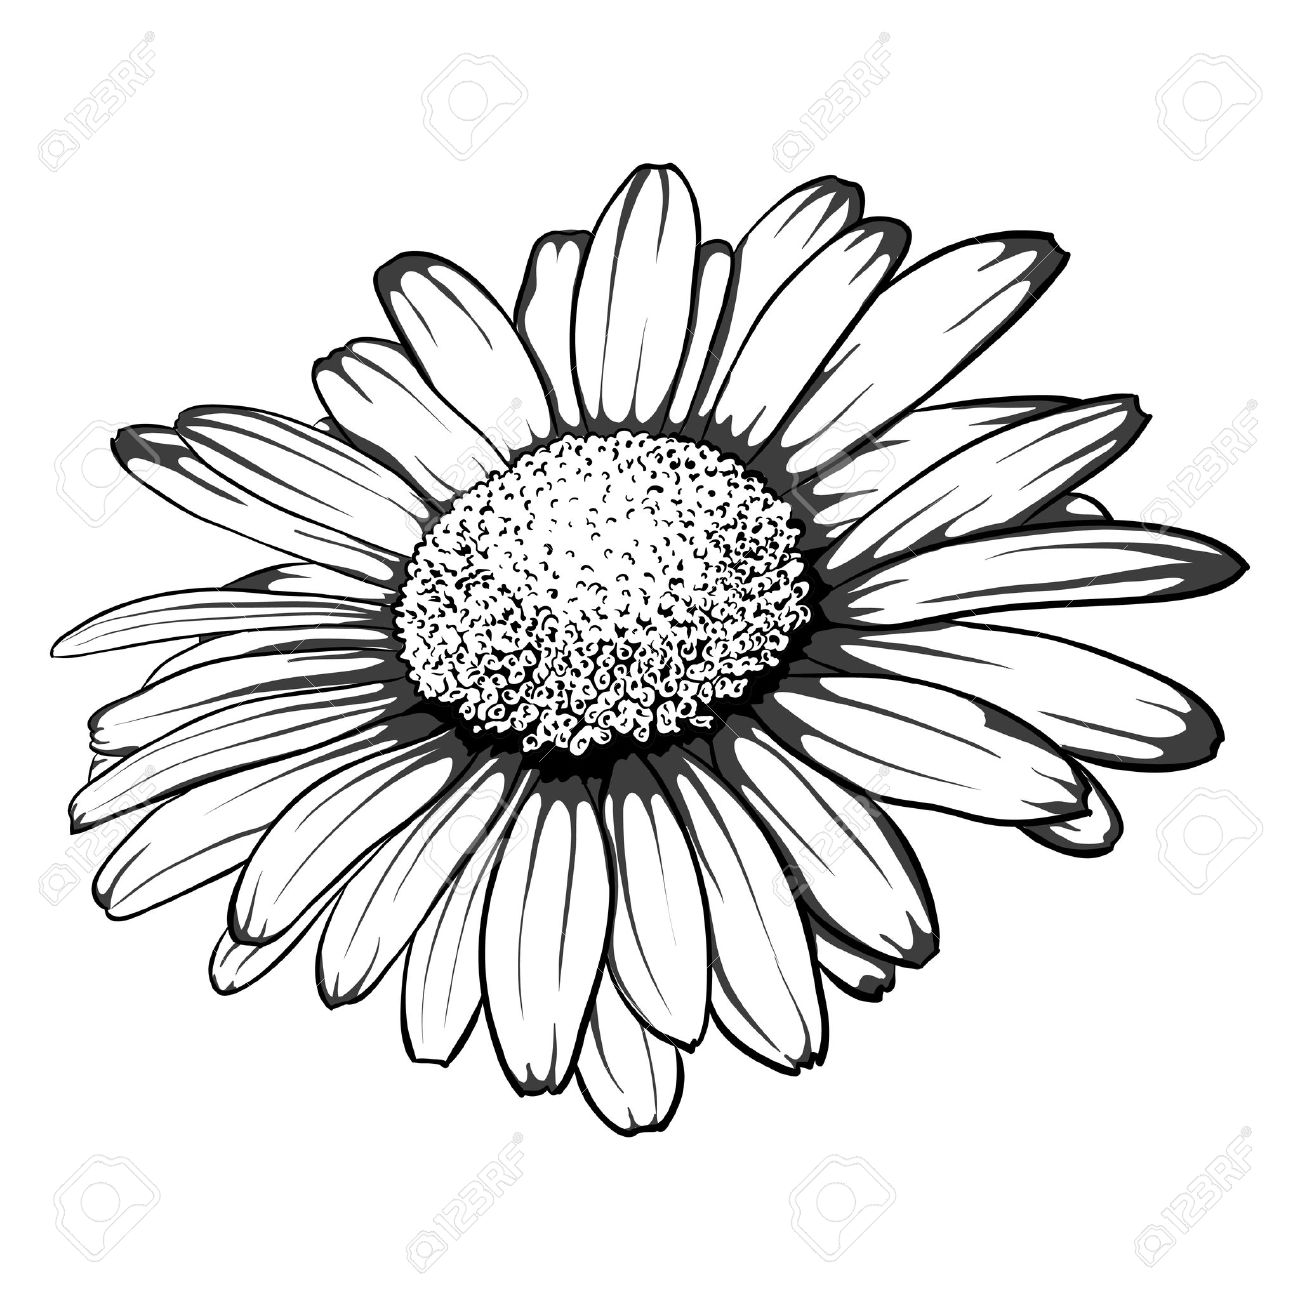 Beautiful monochrome black and white daisy flower isolated beautiful monochrome black and white daisy flower isolated for greeting cards and invitations of m4hsunfo